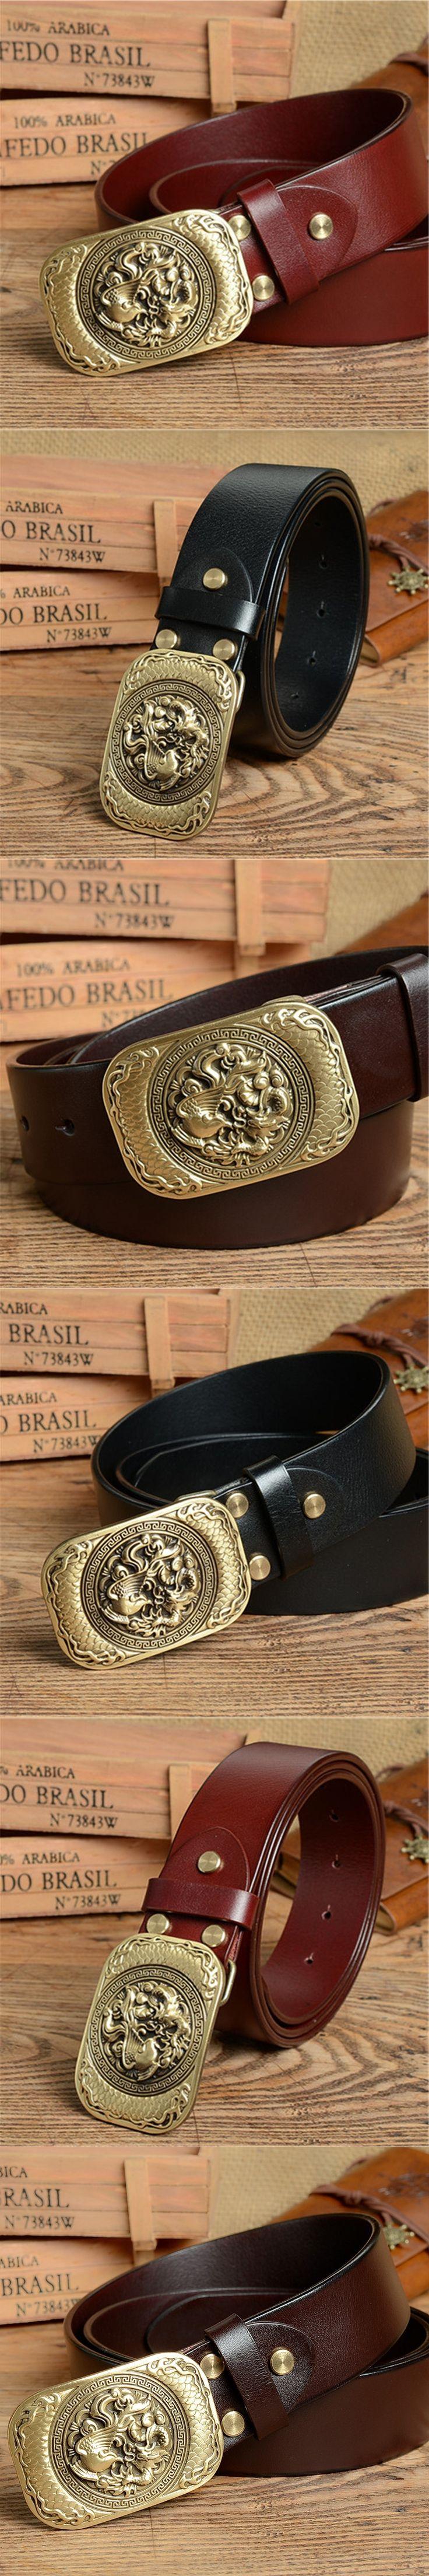 Chinese Style Brass Belt Buckle Mens Belts Luxury Genuine Leather Men Belt Ceinture Homme Cinturones  Male Strap Wide MBT0387